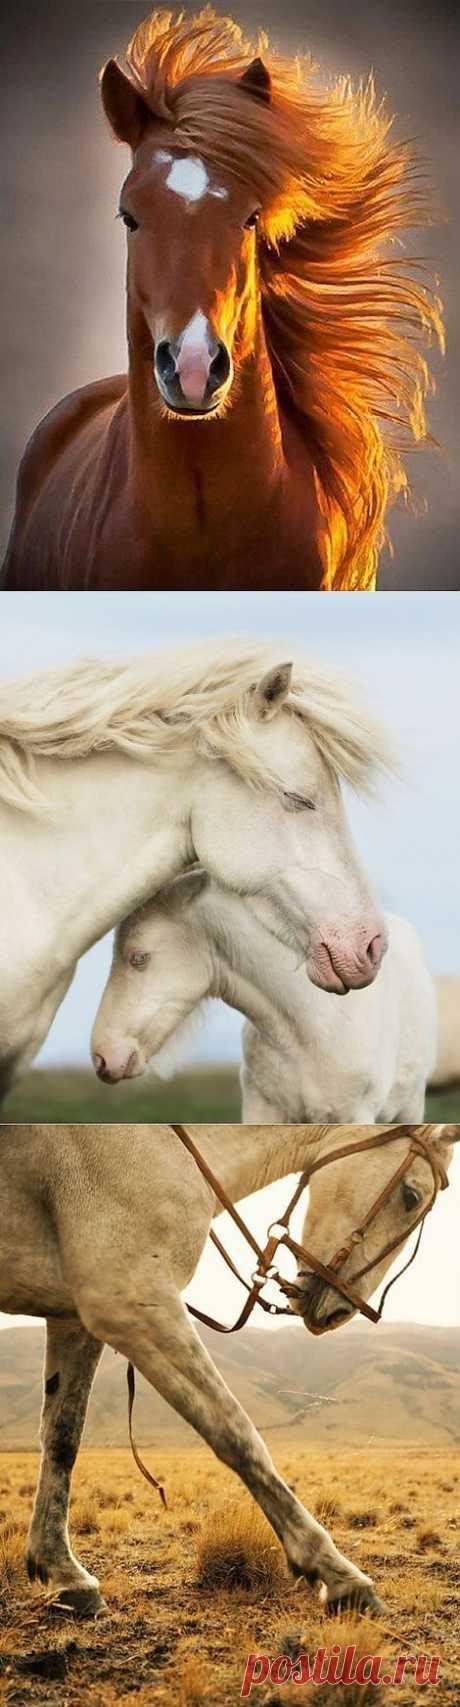 Magnificent, delightful, fantastic and noble horses